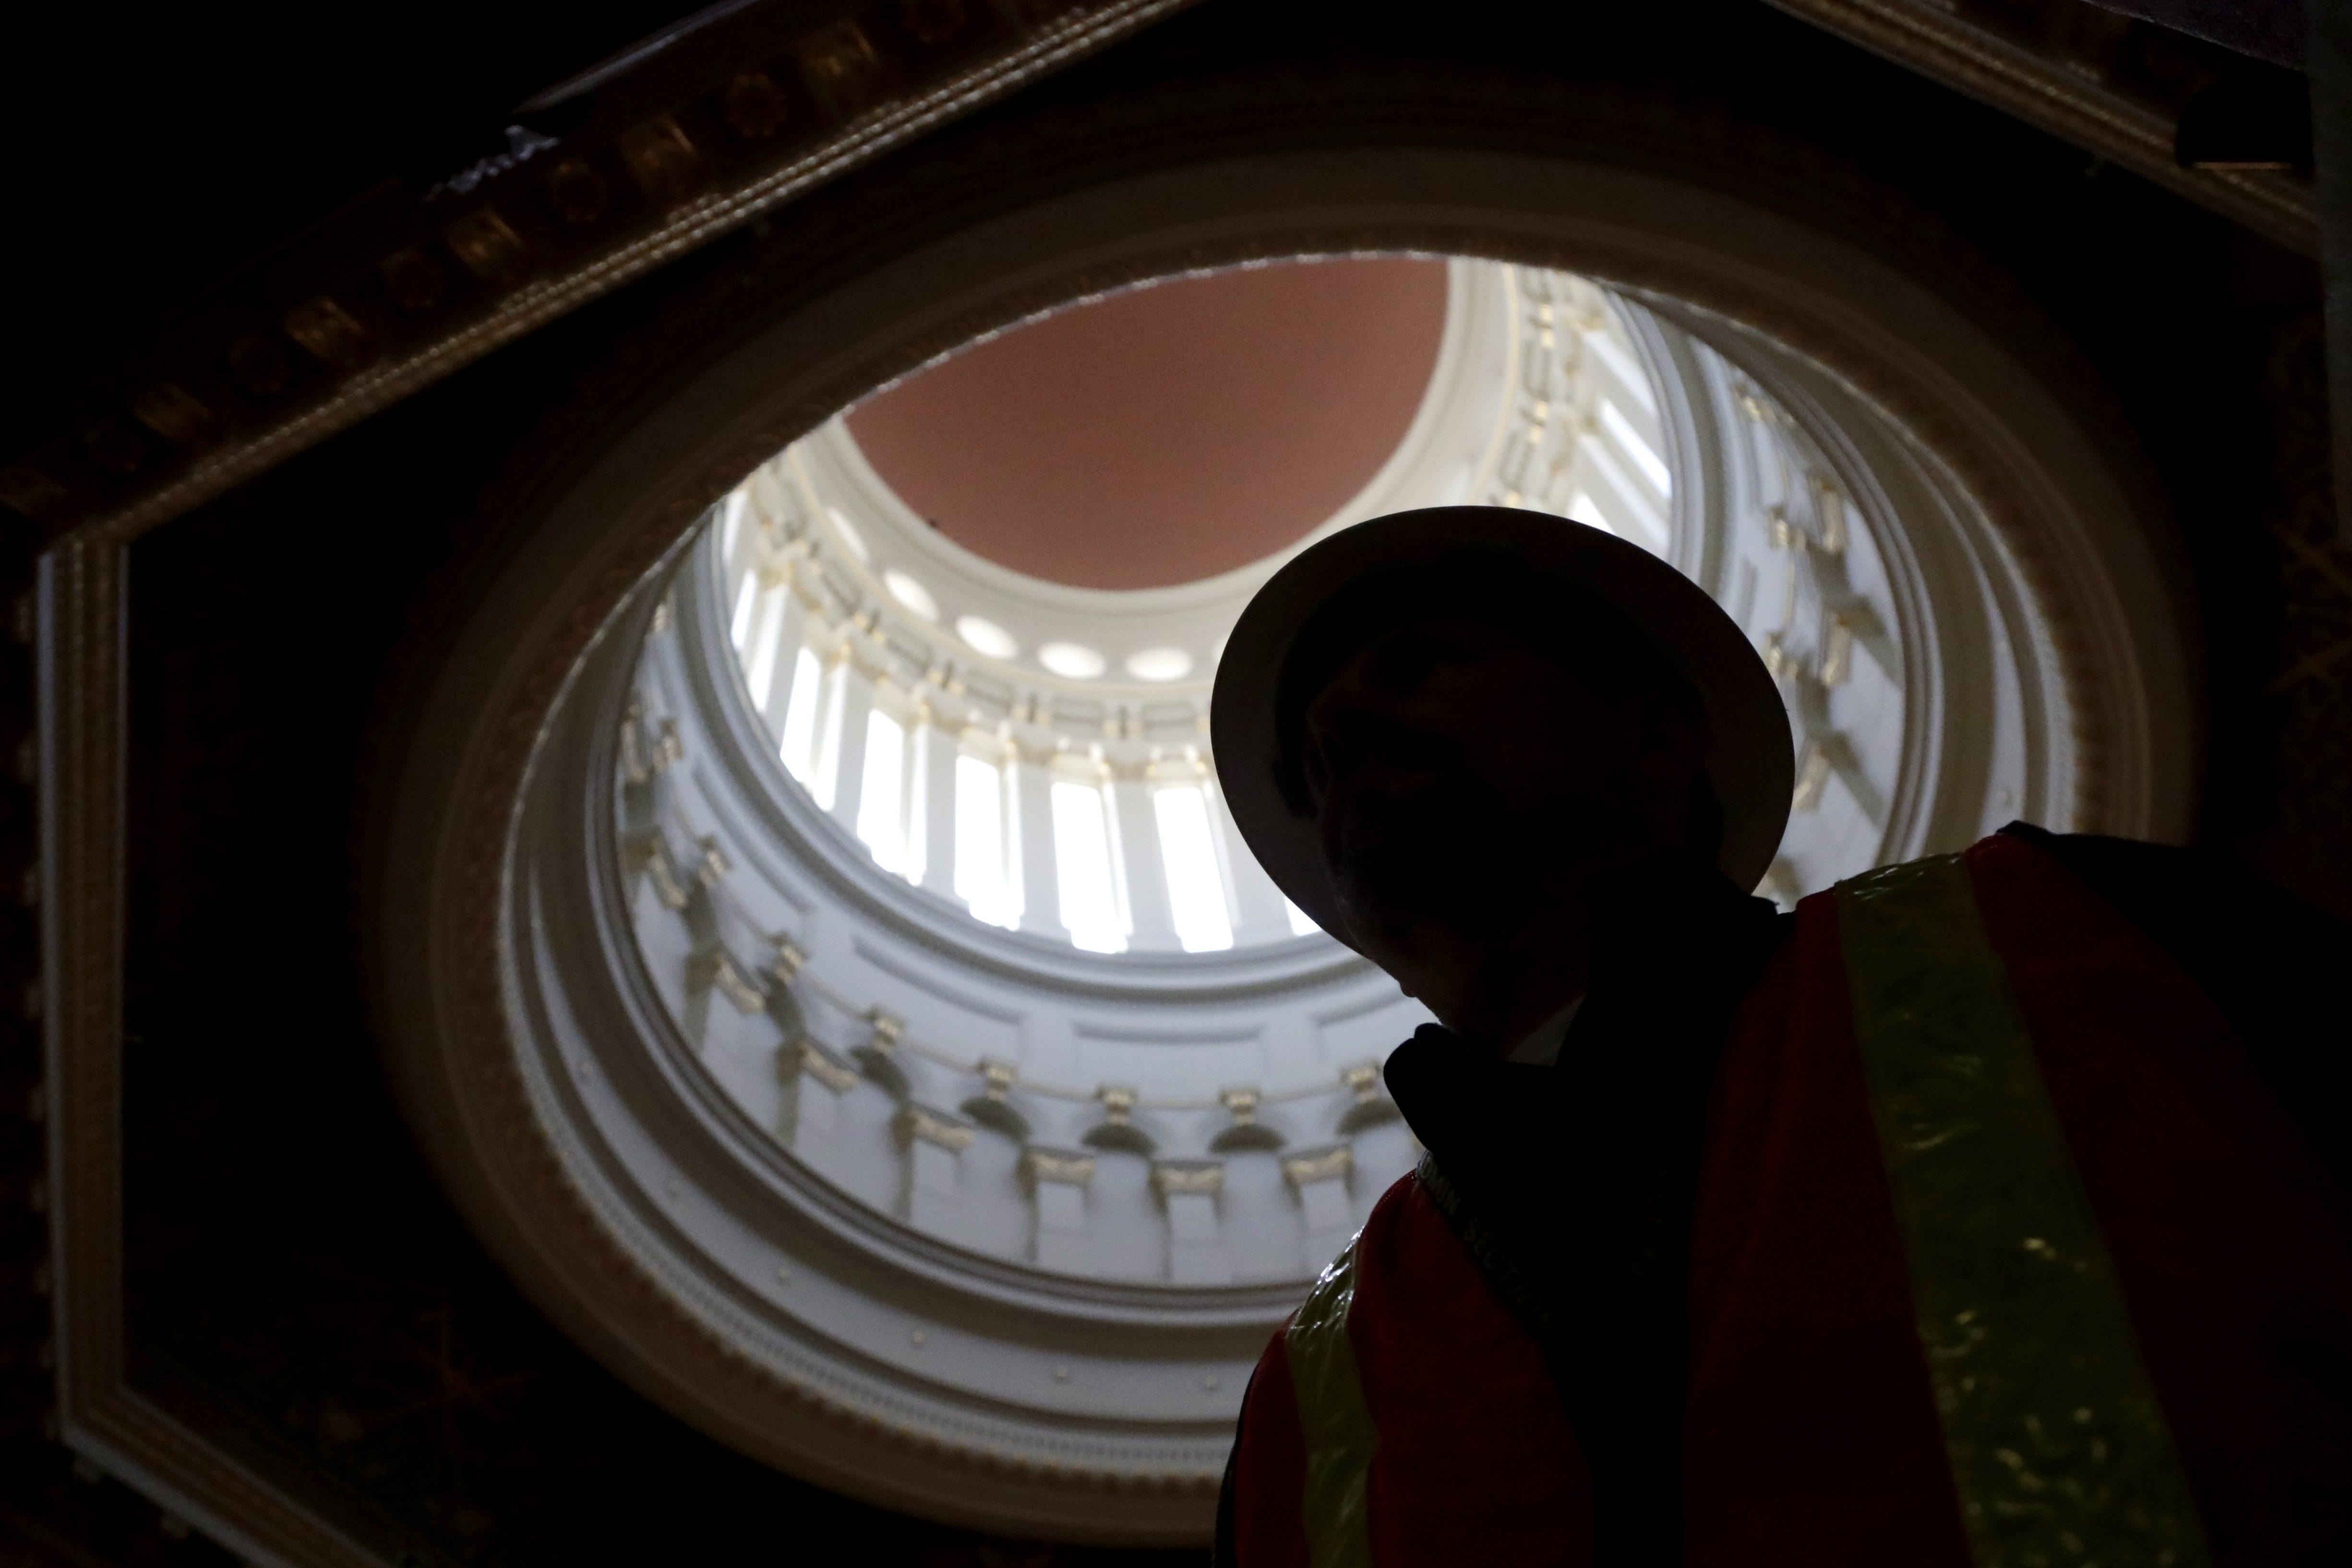 Murphy details plan for major overhaul of N.J. ethics rules